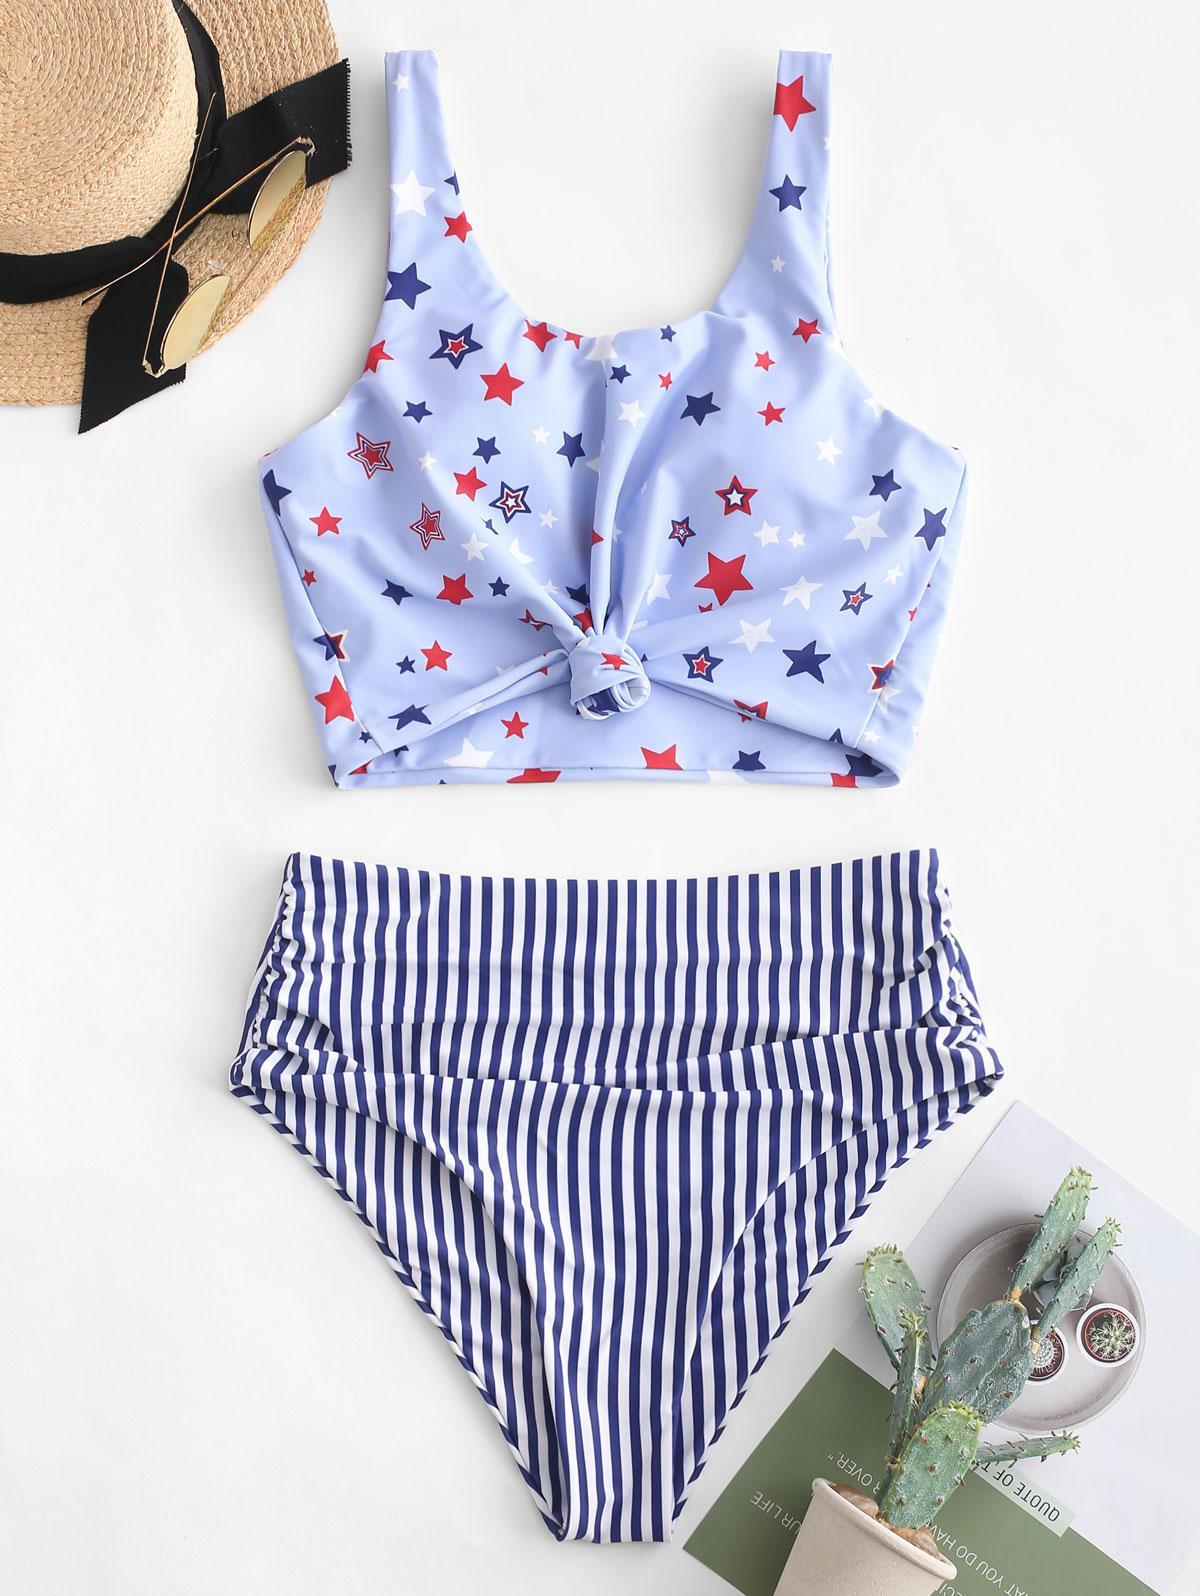 ZAFUL Knot Ruched American Flag Tankini Swimsuit, Denim dark blue